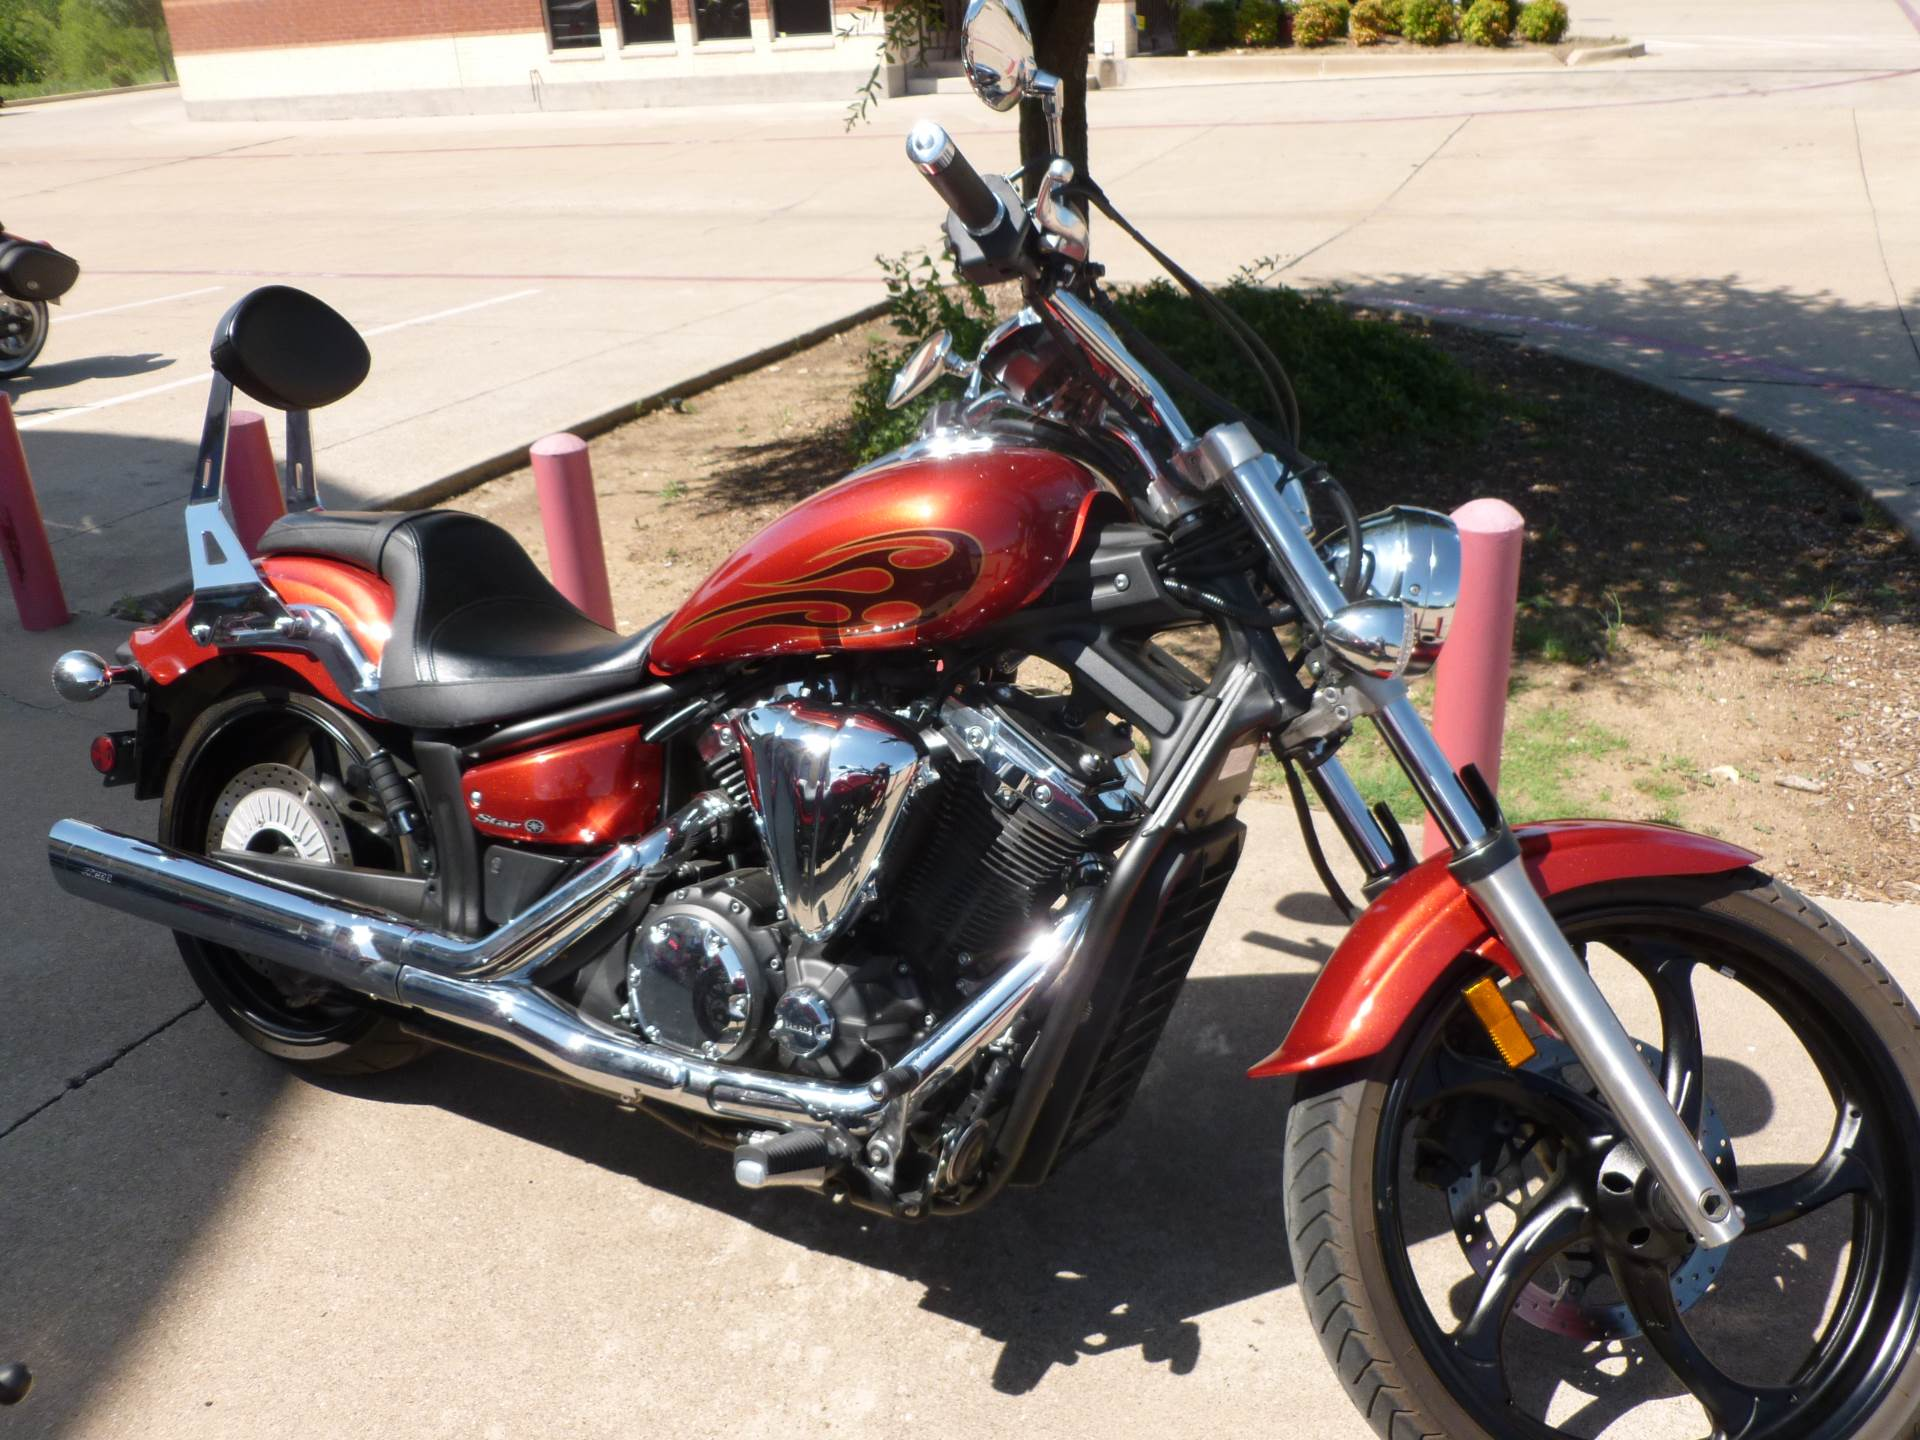 2011 Yamaha Stryker for sale 48555